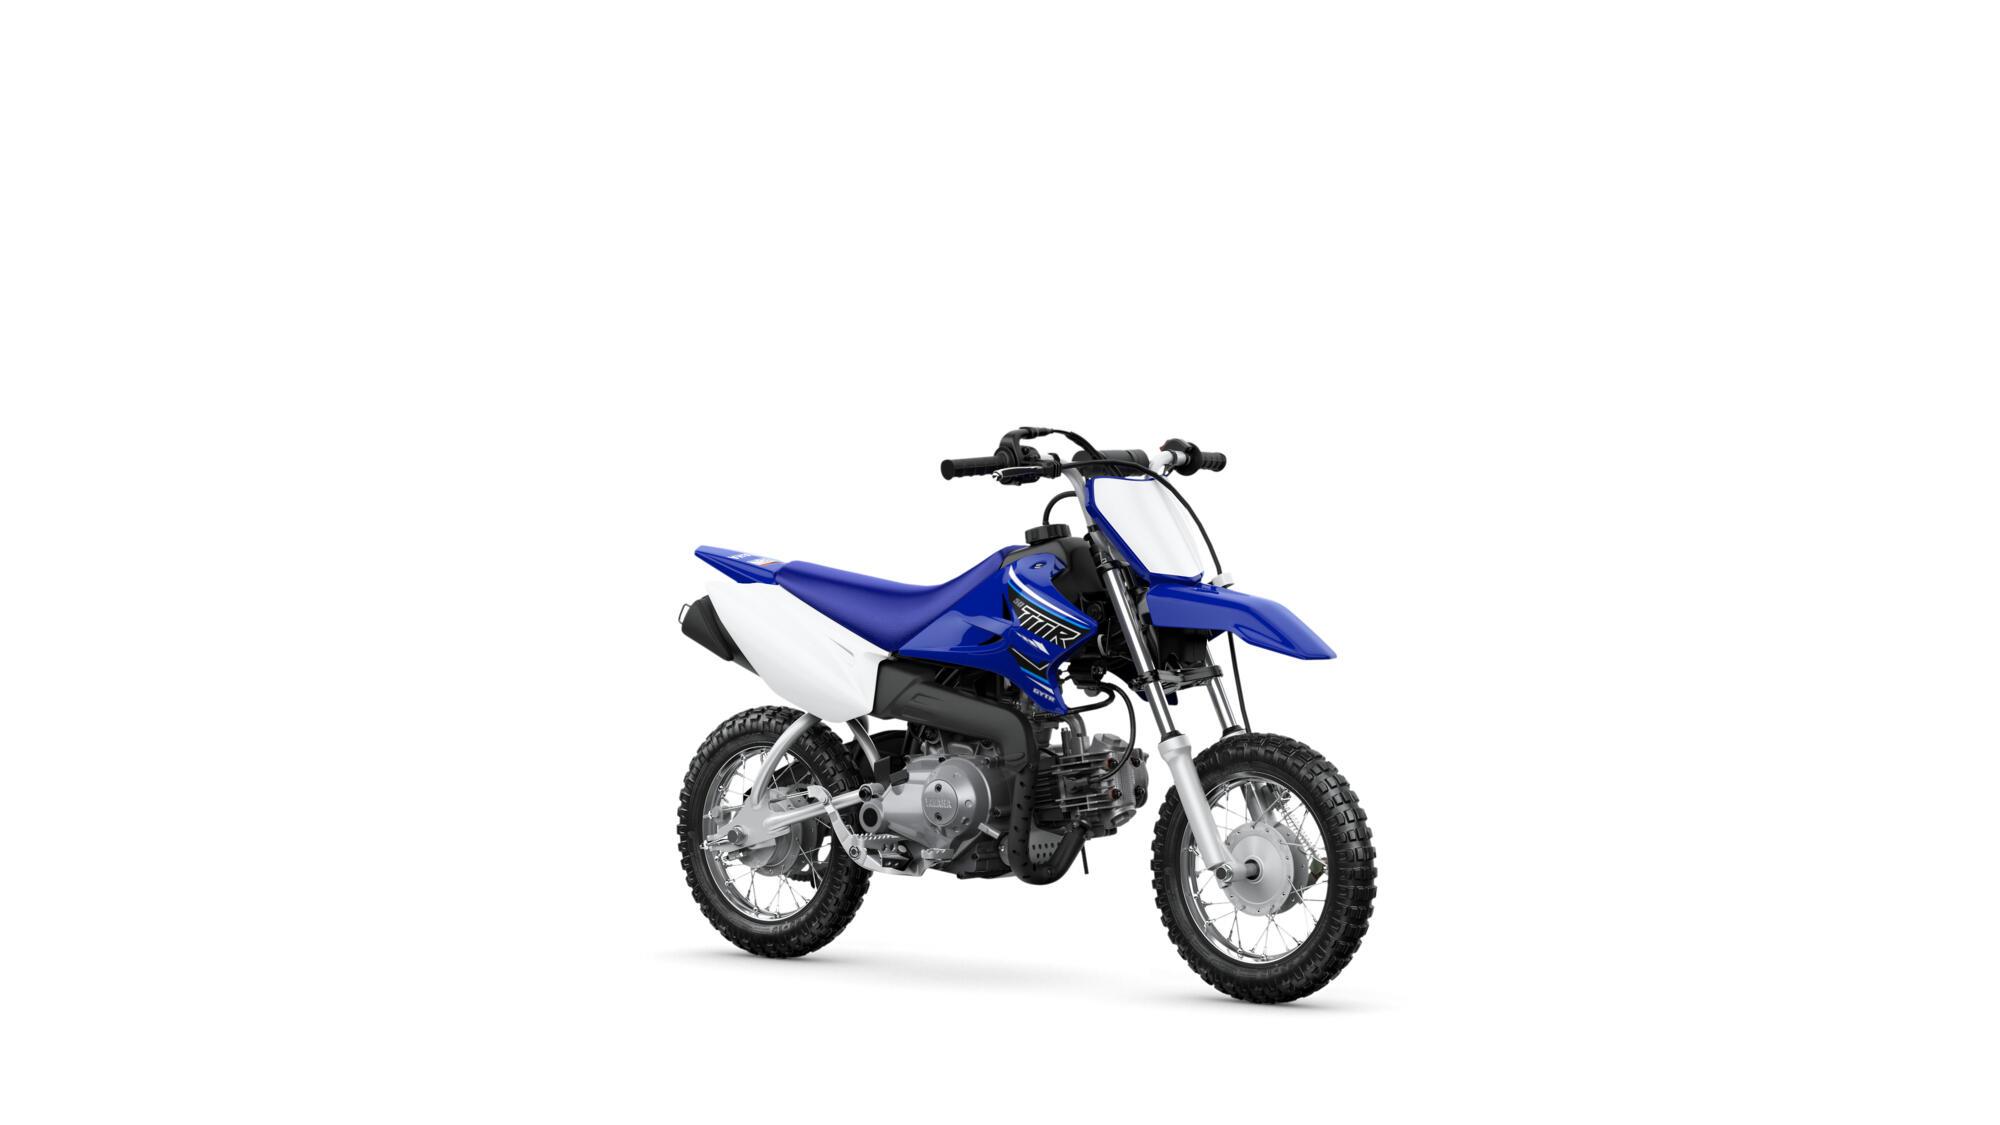 2021-Yamaha-TTR50-EU-Icon_Blue-Studio-001-03